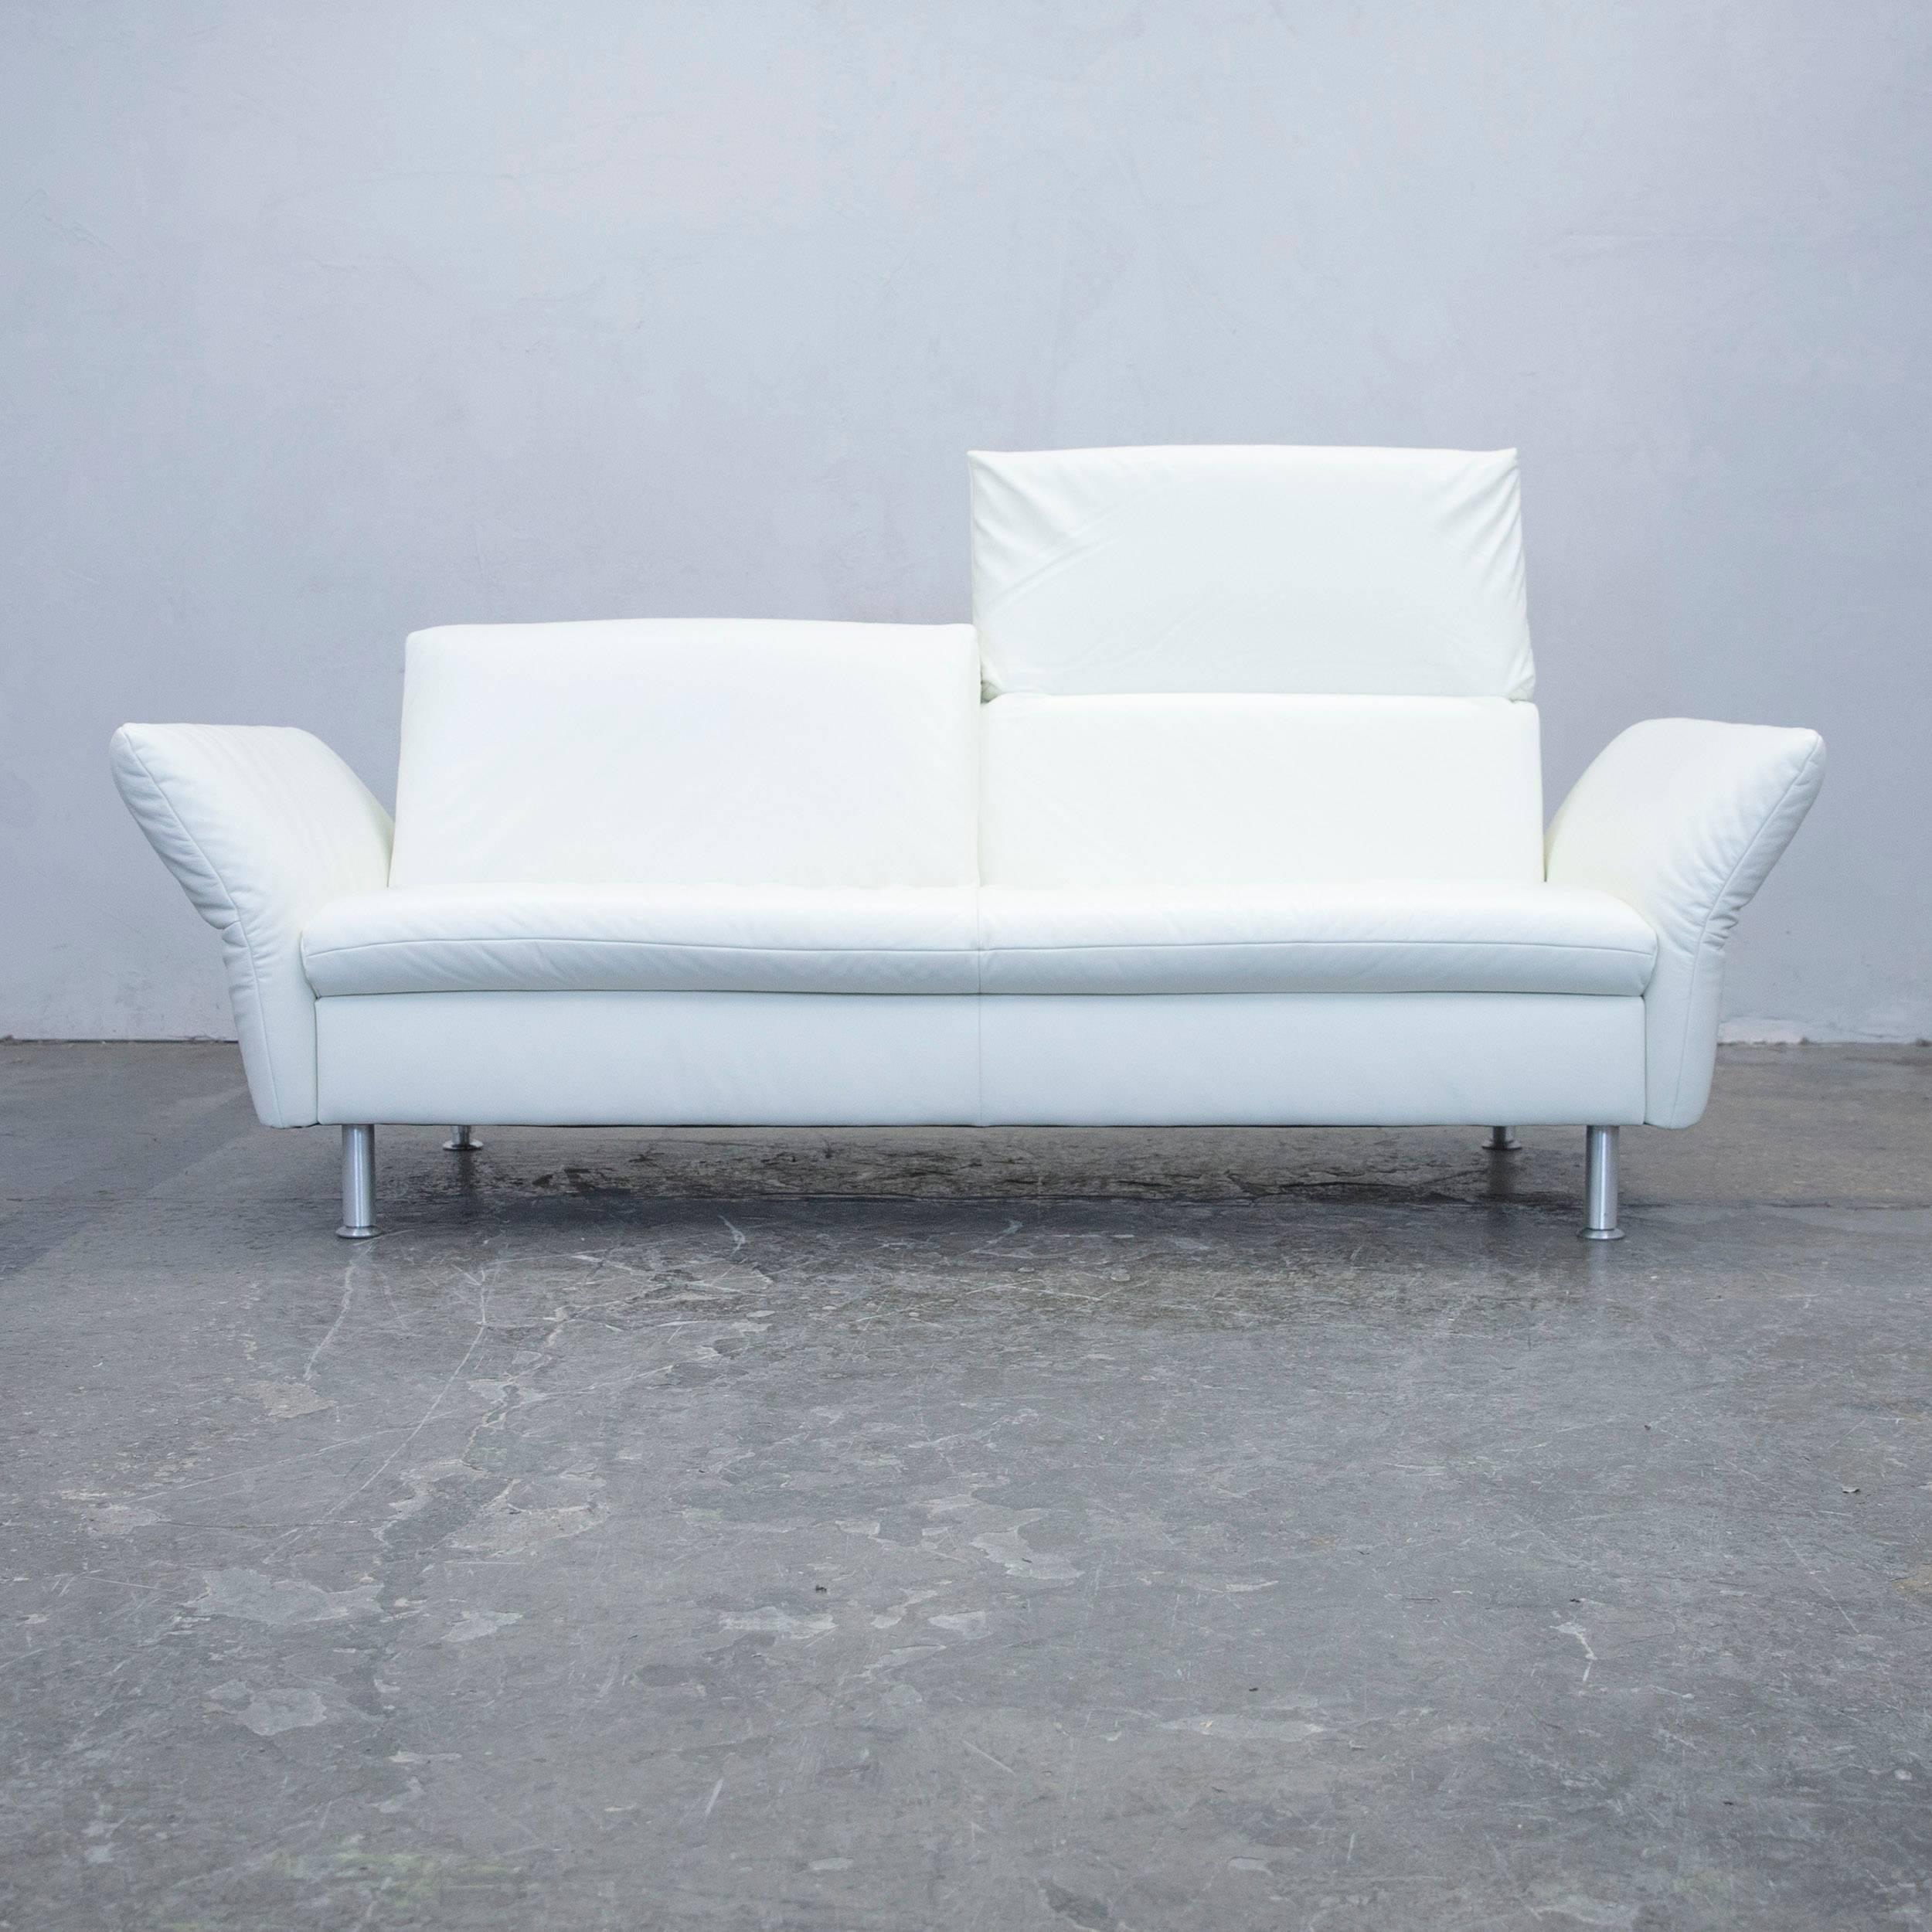 White Colored Original Koinor Designer Leather Sofa Set, In A Minimalistic  And Modern Design,